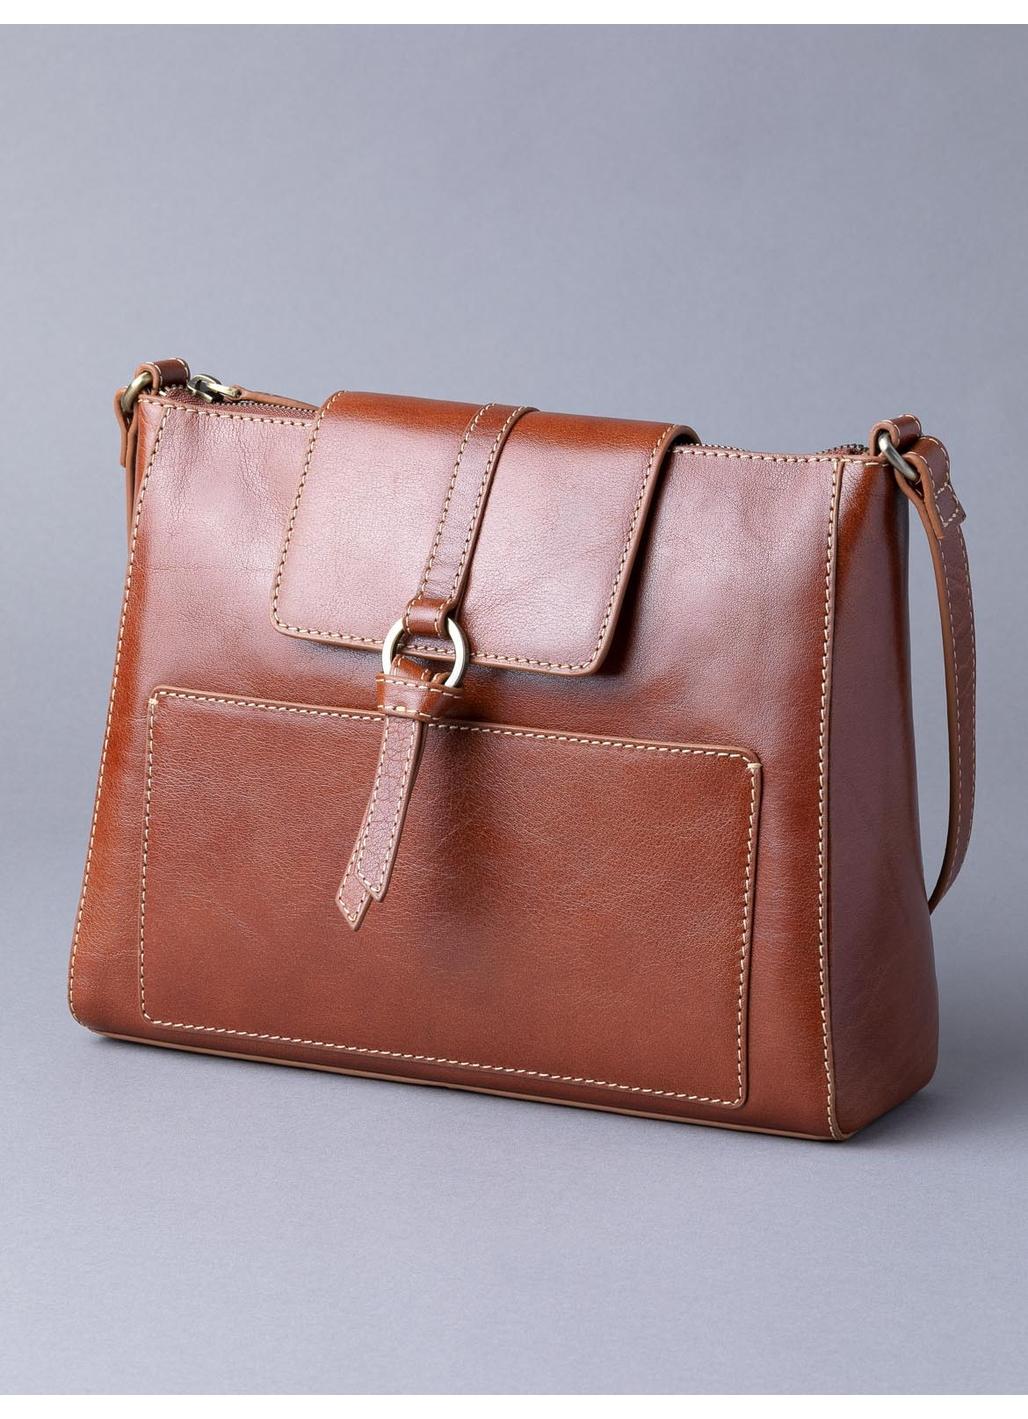 Birthwaite Leather Shoulder Bag in Cognac